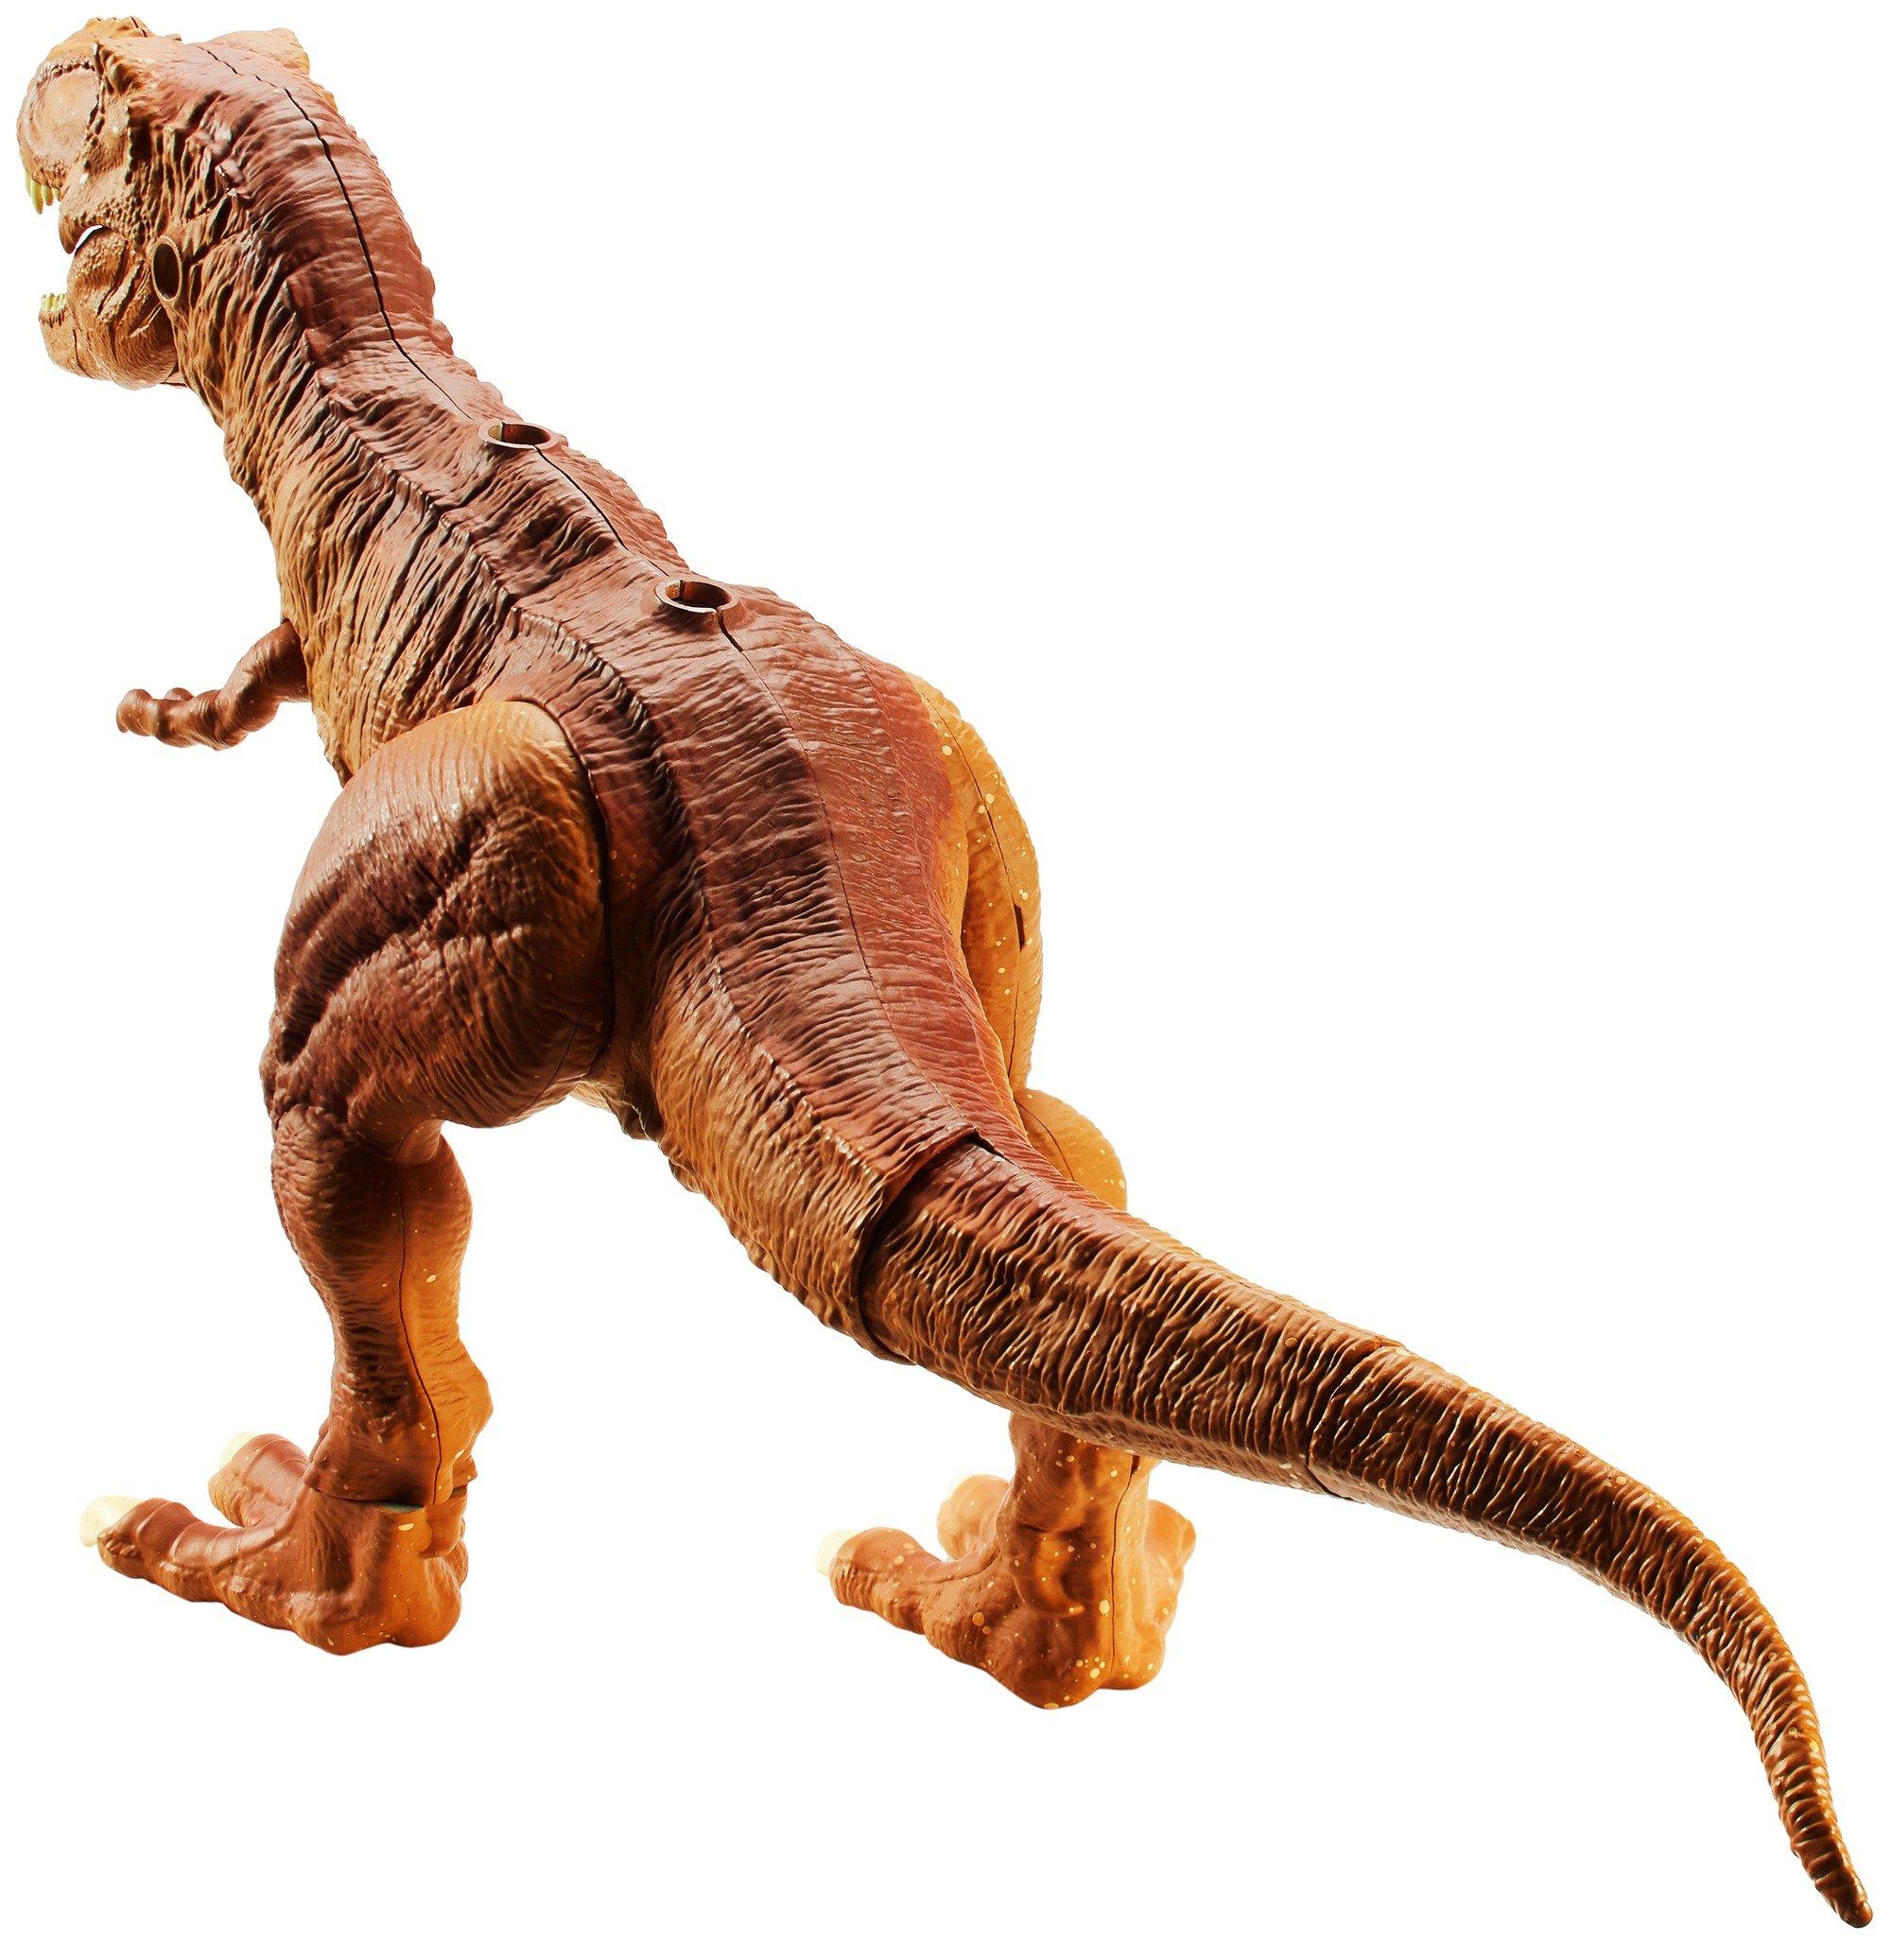 Jurassic World Stem Tyrannosaurus Rex Anatomy Kit by Jurassic World Toys (Image #8)